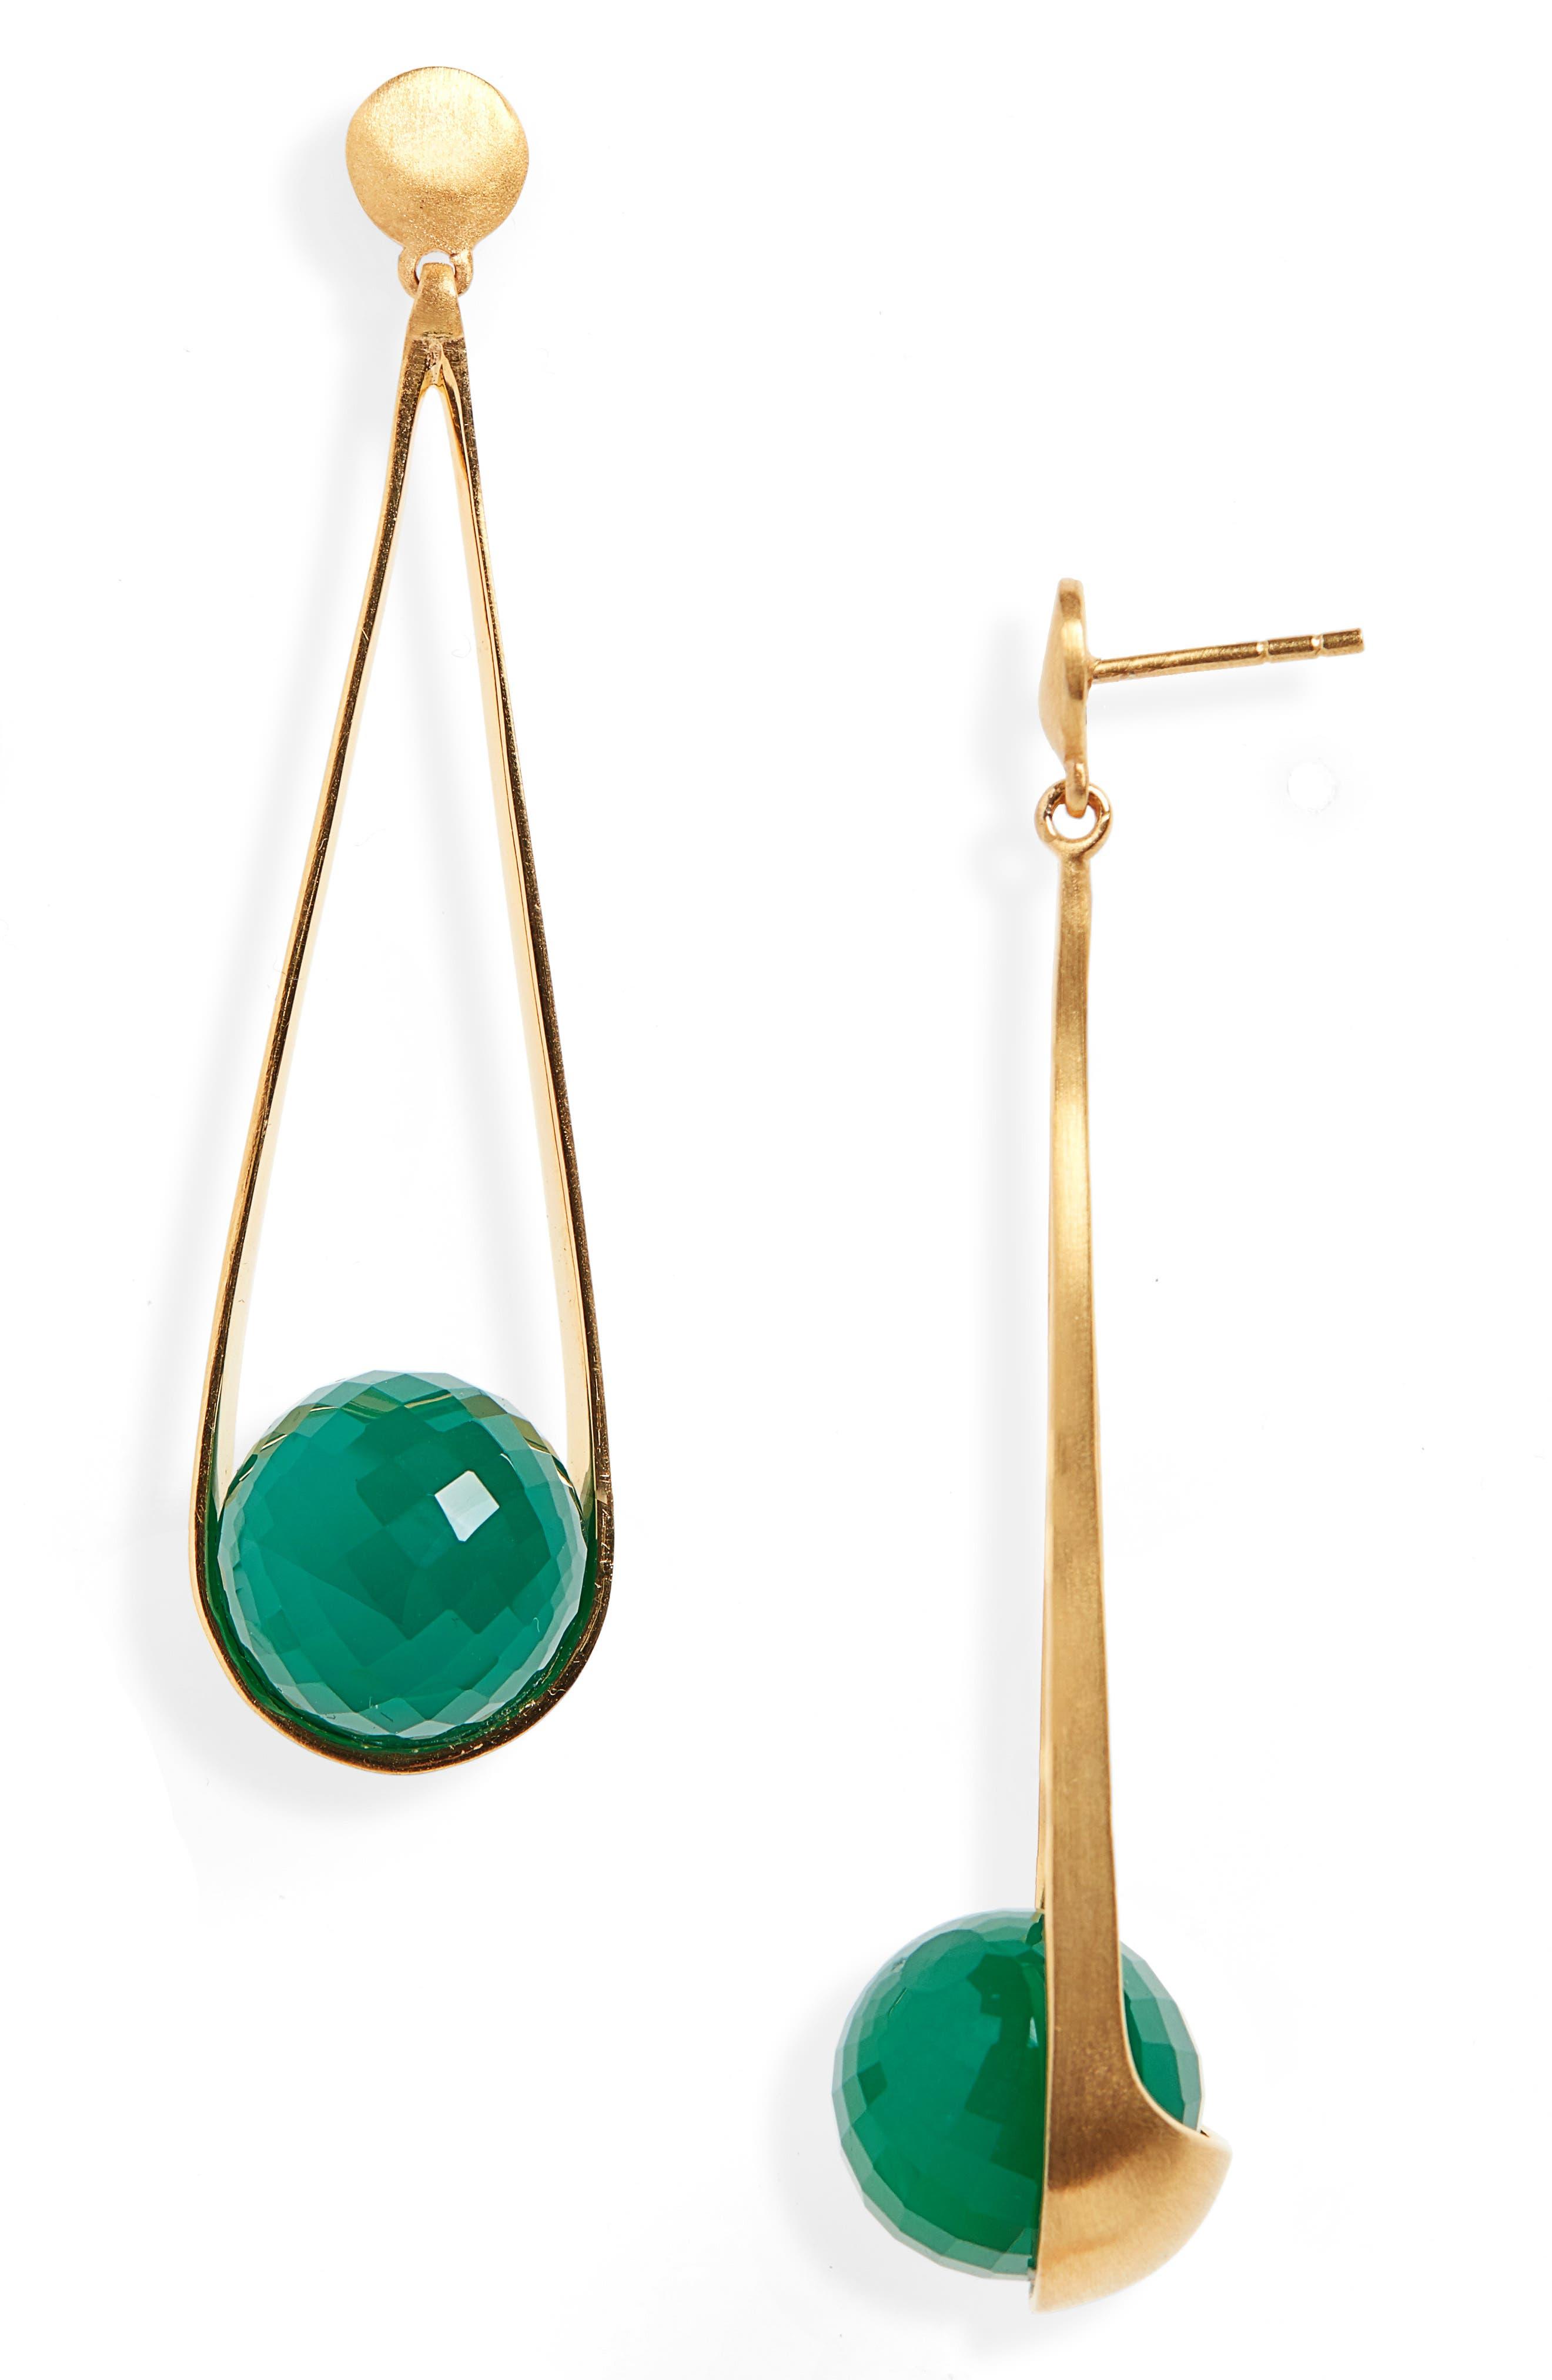 Ipanema Earrings,                         Main,                         color, GREEN ONYX/ GOLD